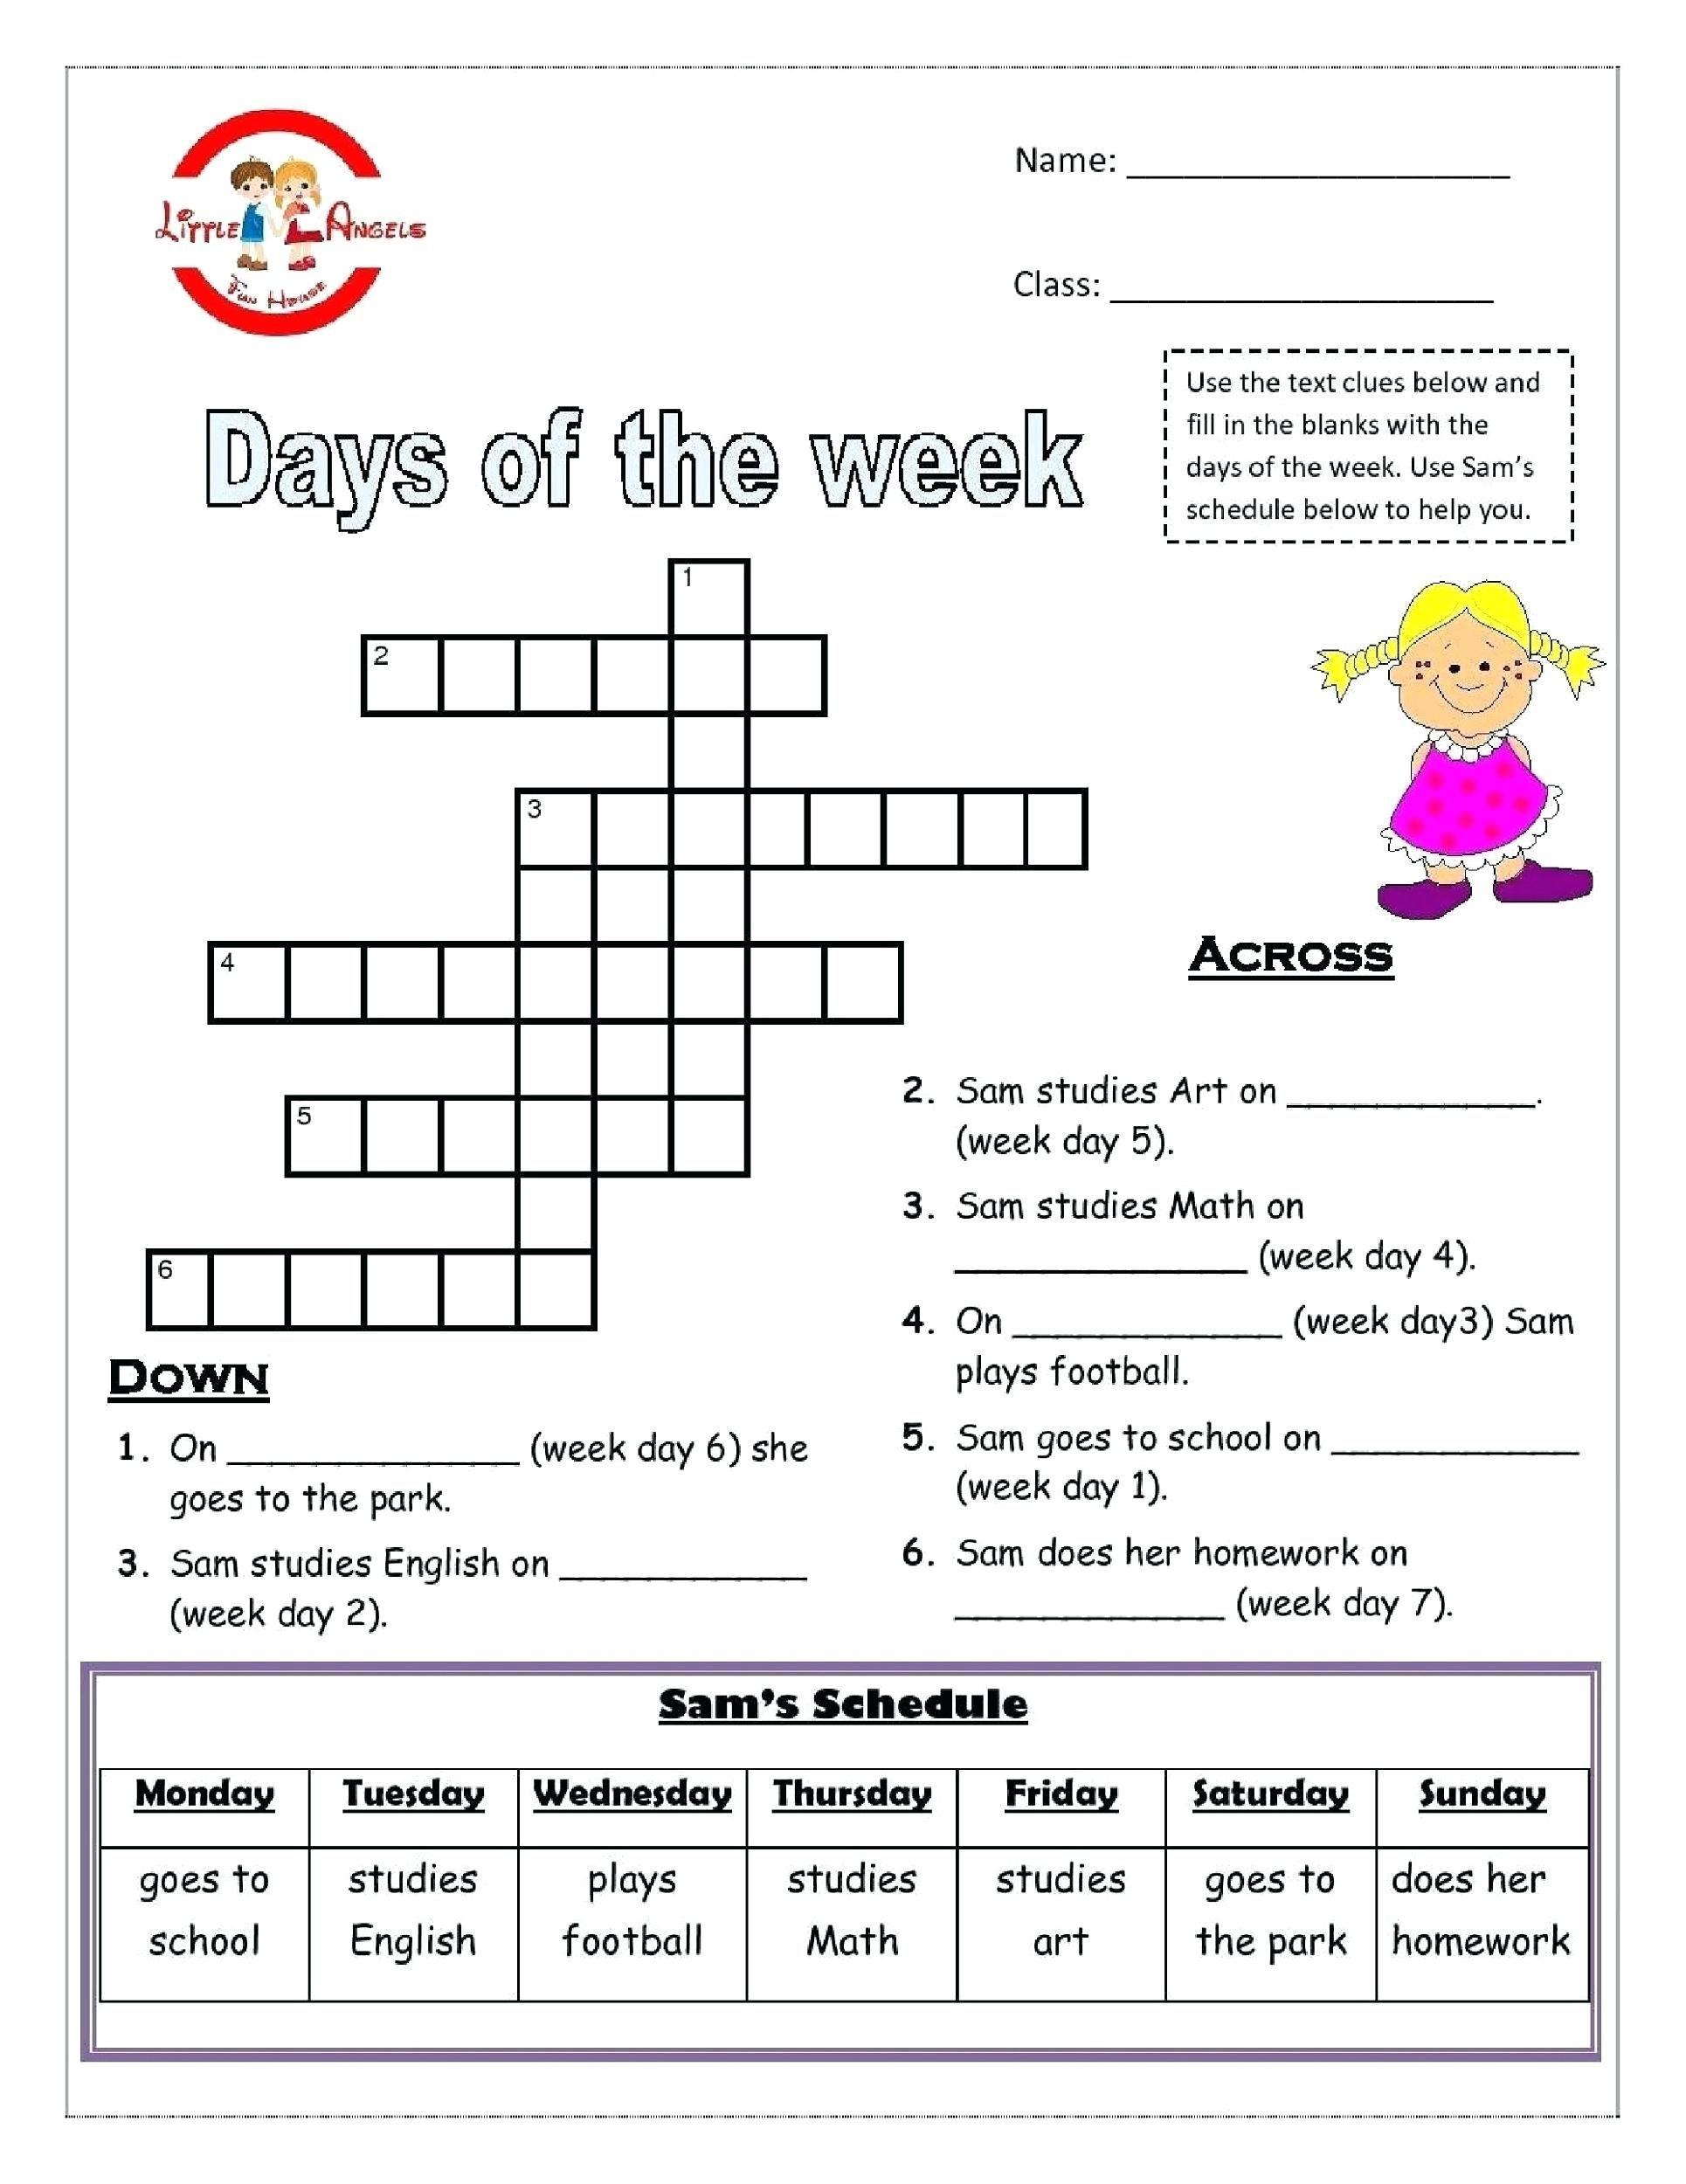 Image Result For Free Esl Printable Worksheets Grade 4 | Hjj - Free Printable English Lessons